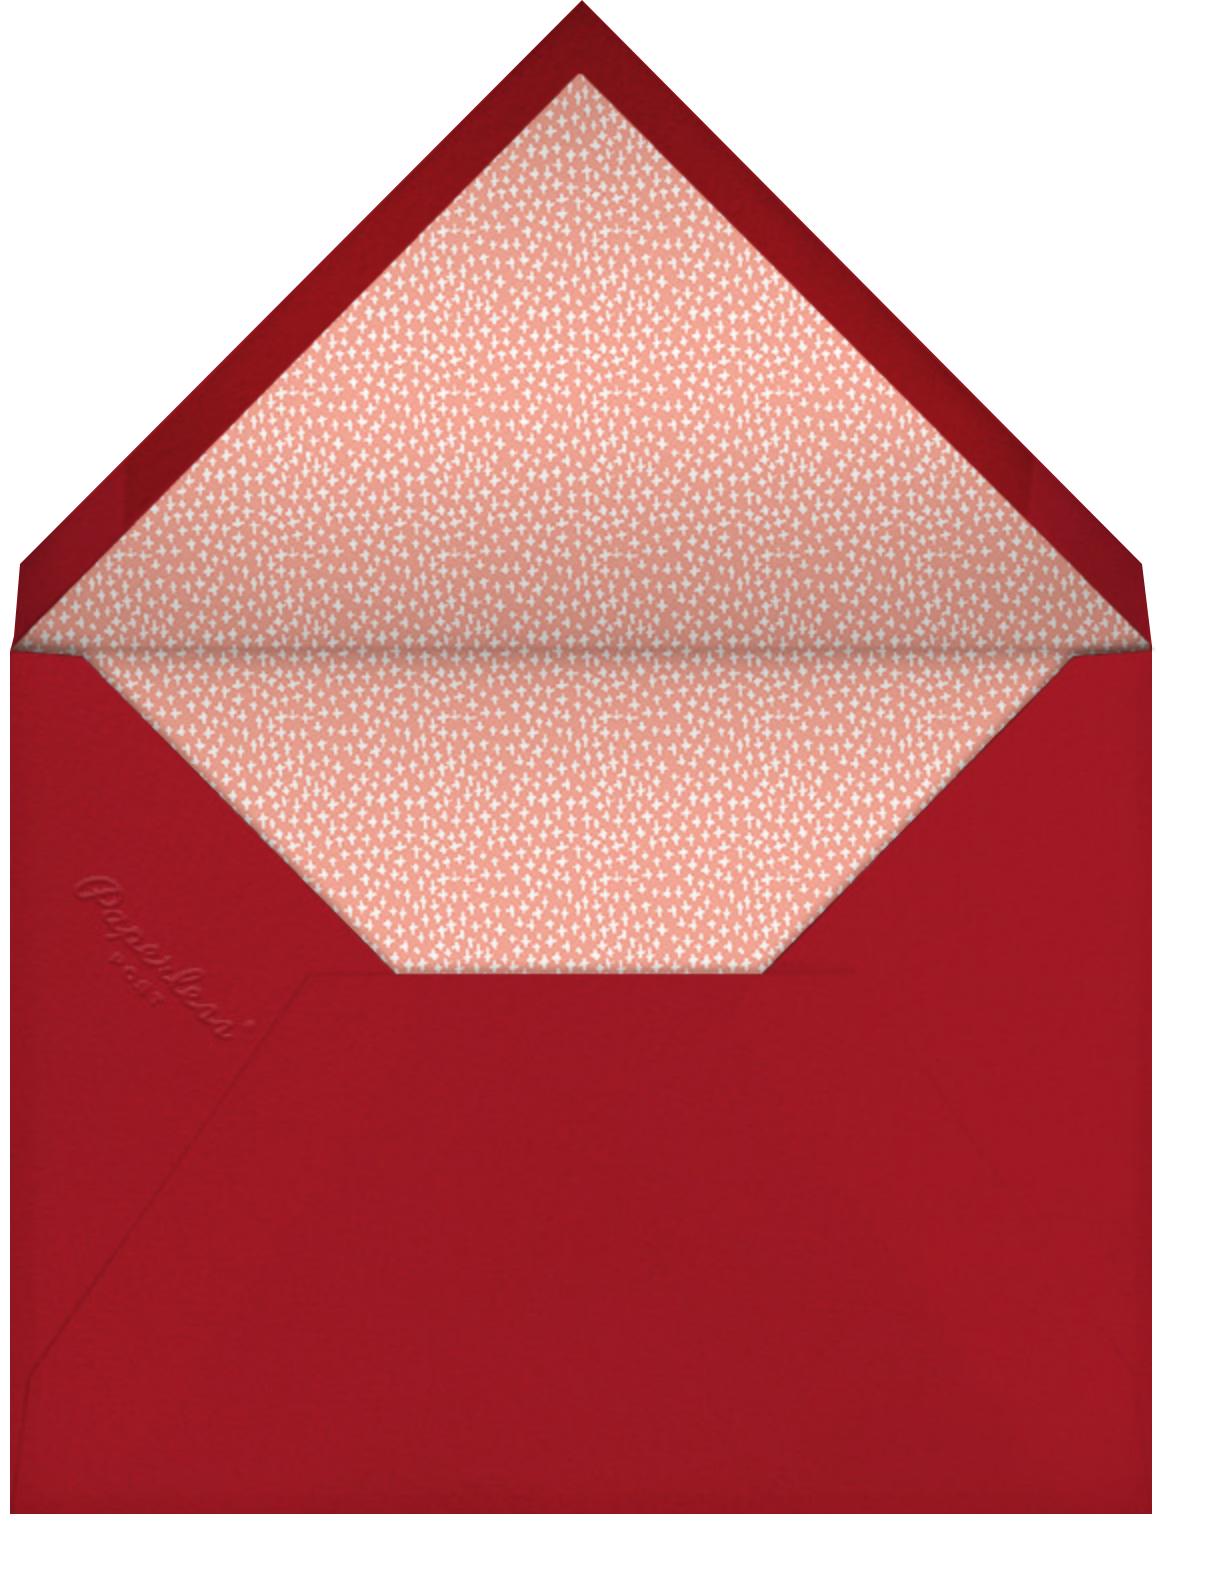 The House is Open - Mr. Boddington's Studio - Envelope